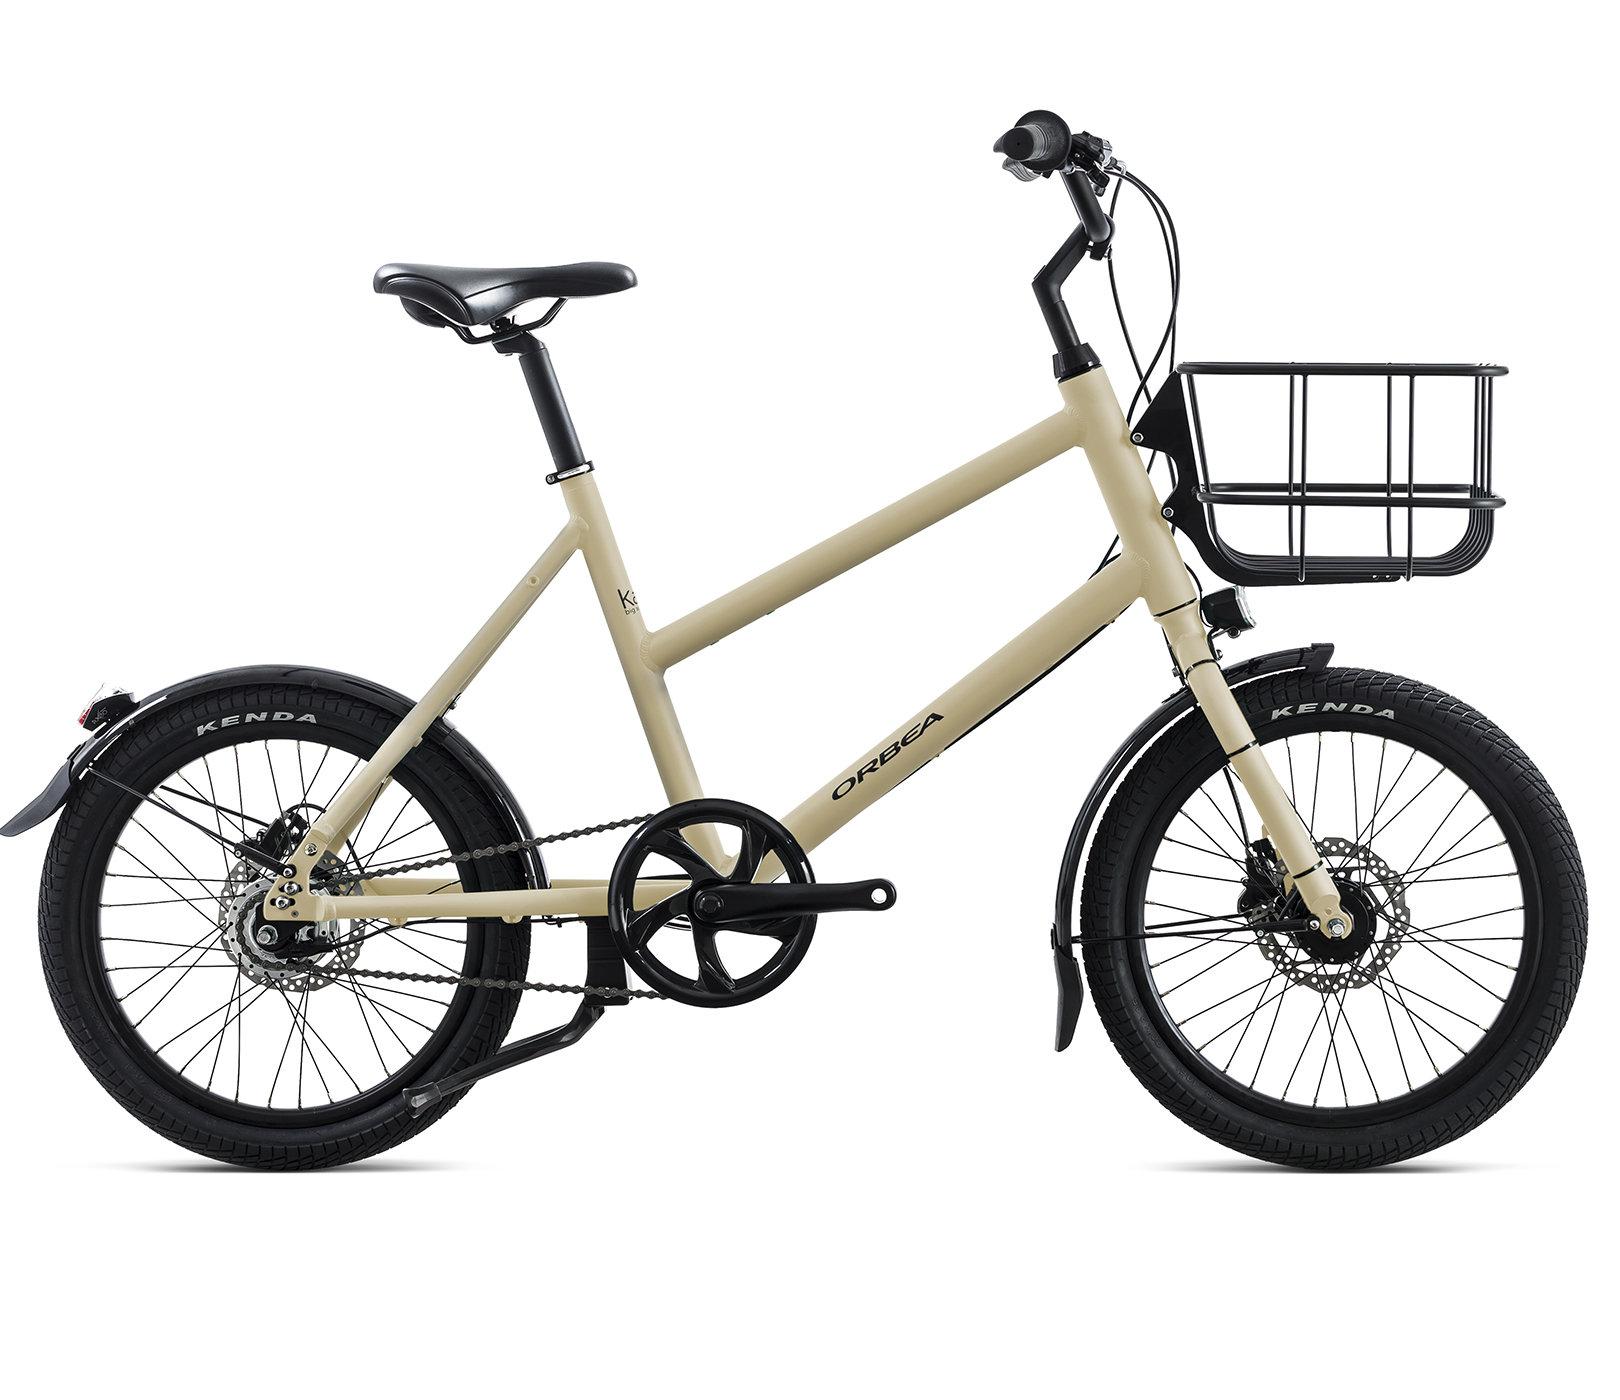 d9cf7acdc67 Orbea Katu 30 - New Horizons Bikes, Westfield MA